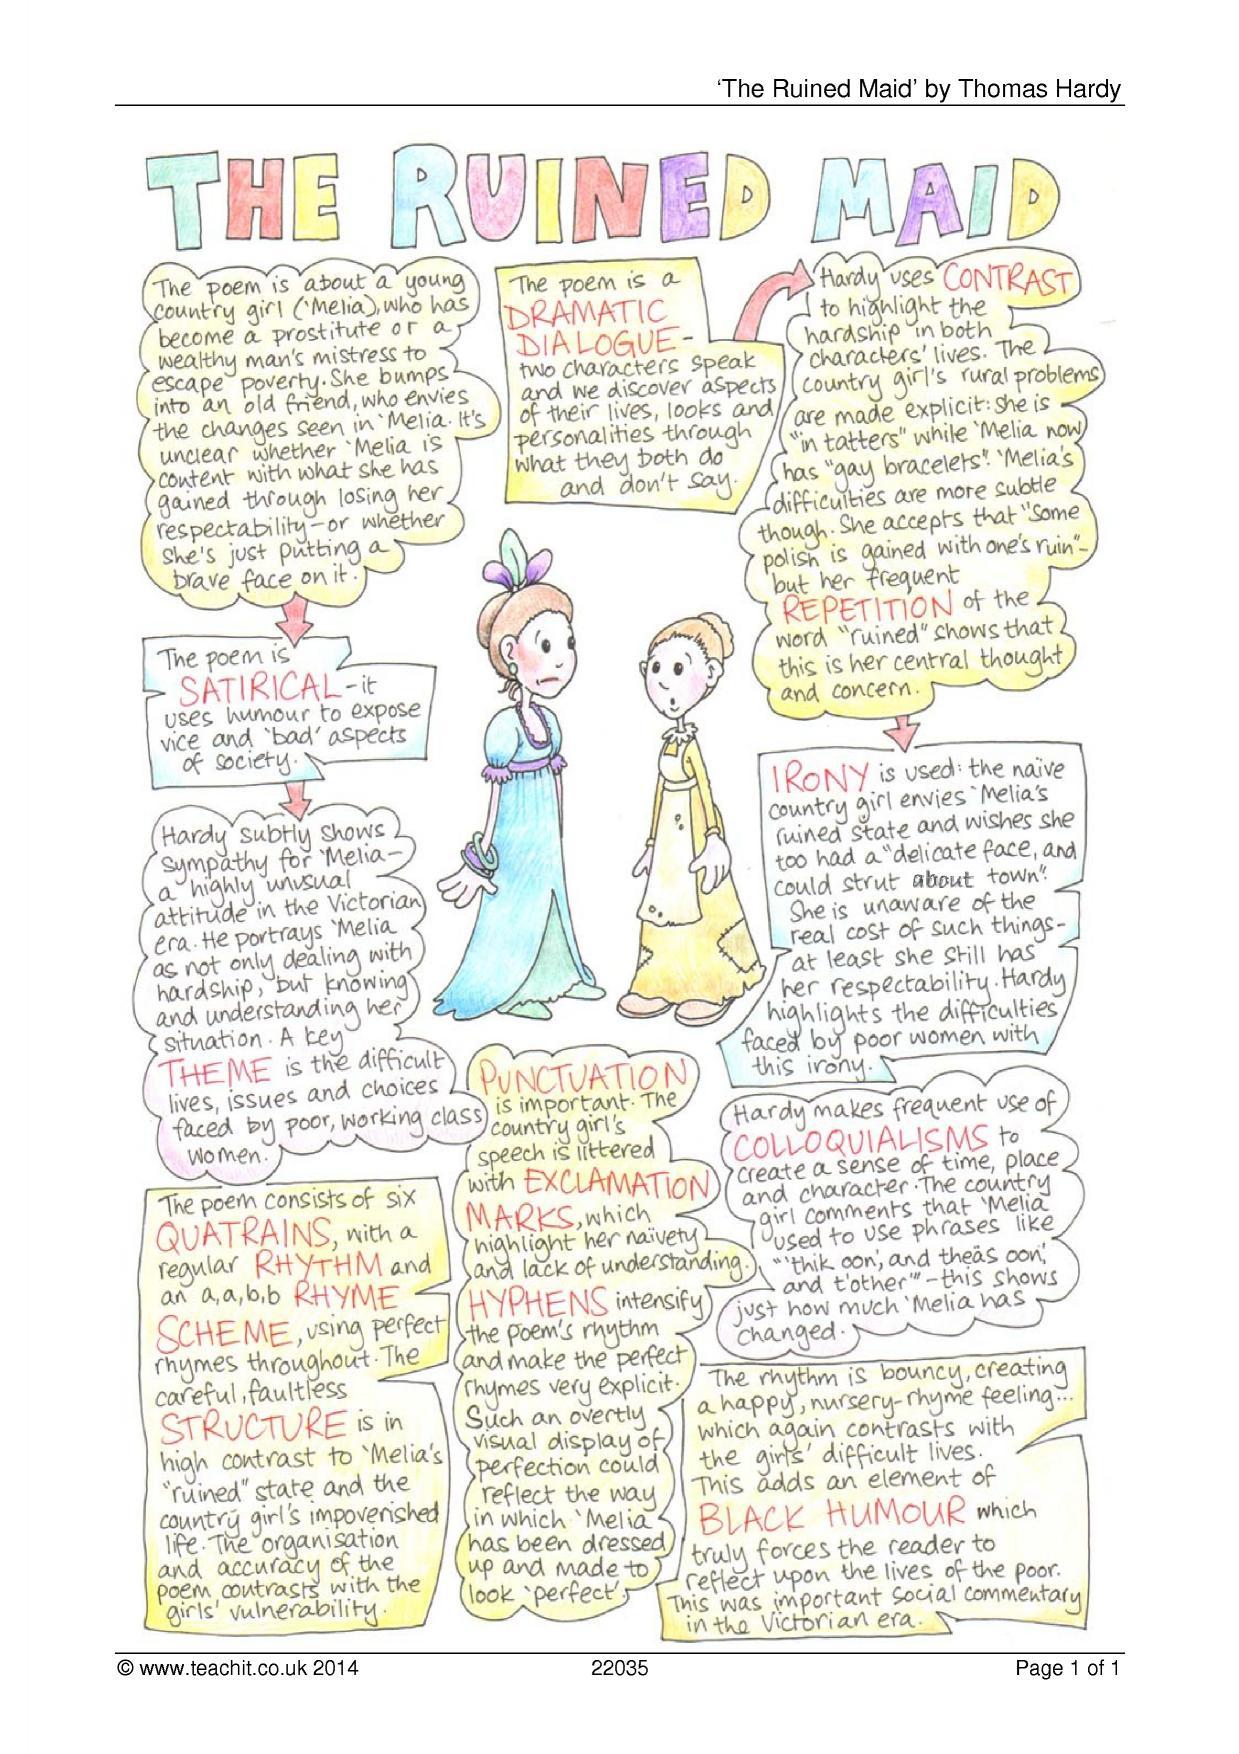 The Ruined Maid - Thomas Hardy: A Critical Essay